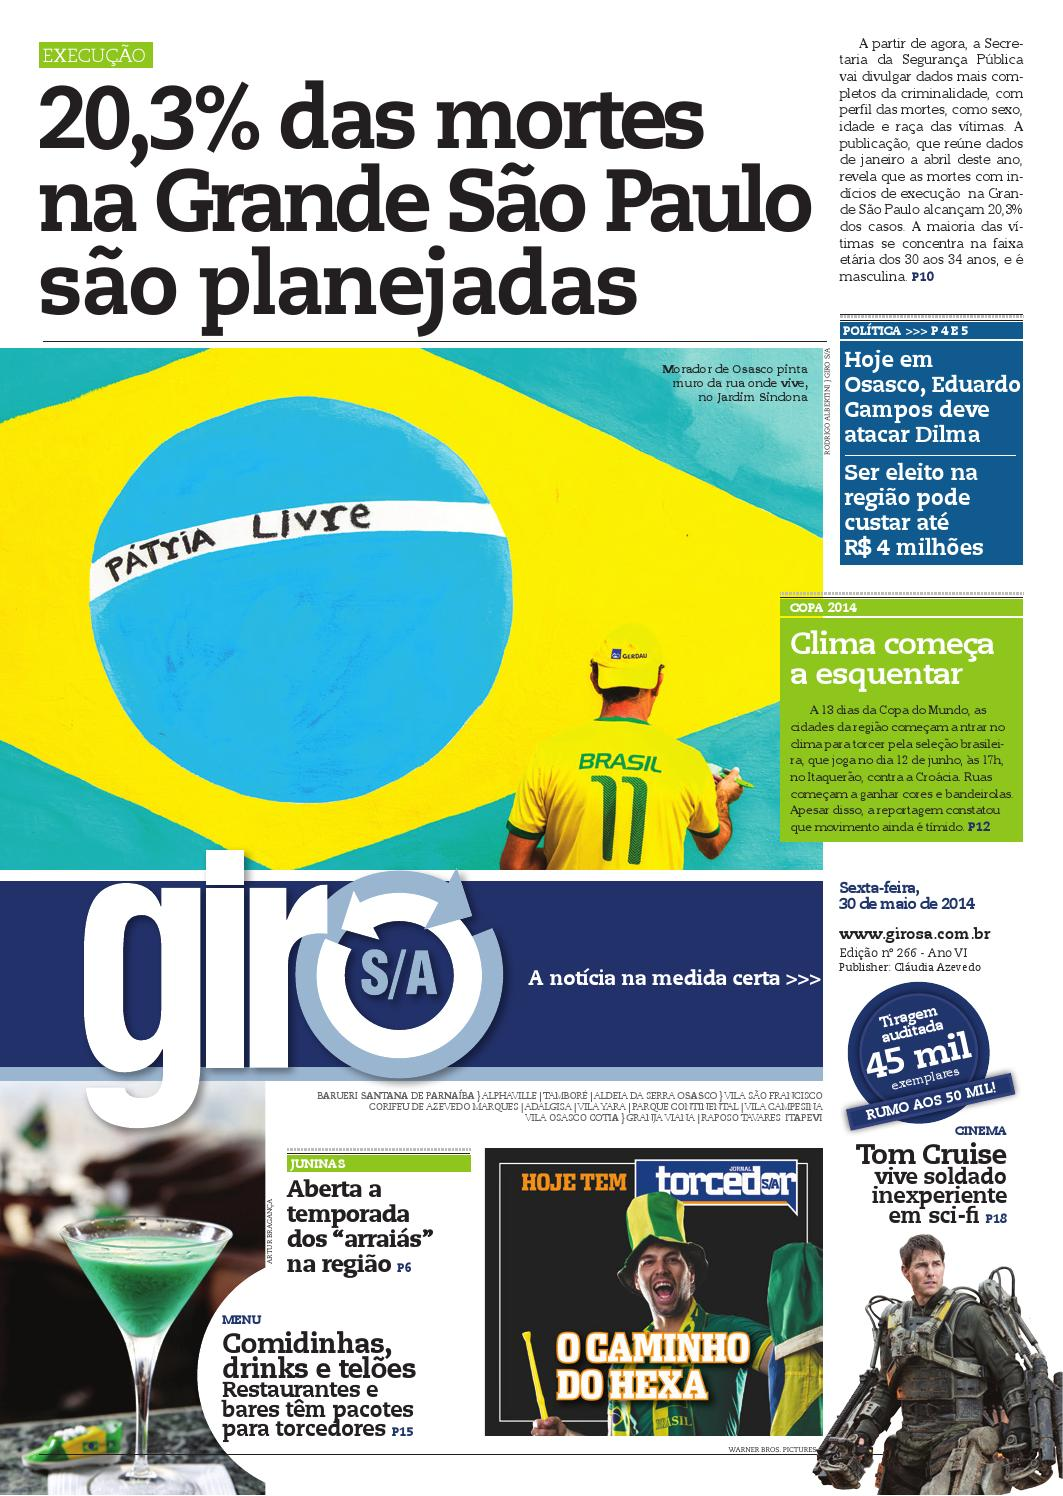 Giro S A e Torcedor S A by Agência Impacto - issuu ad09172c0b1d2